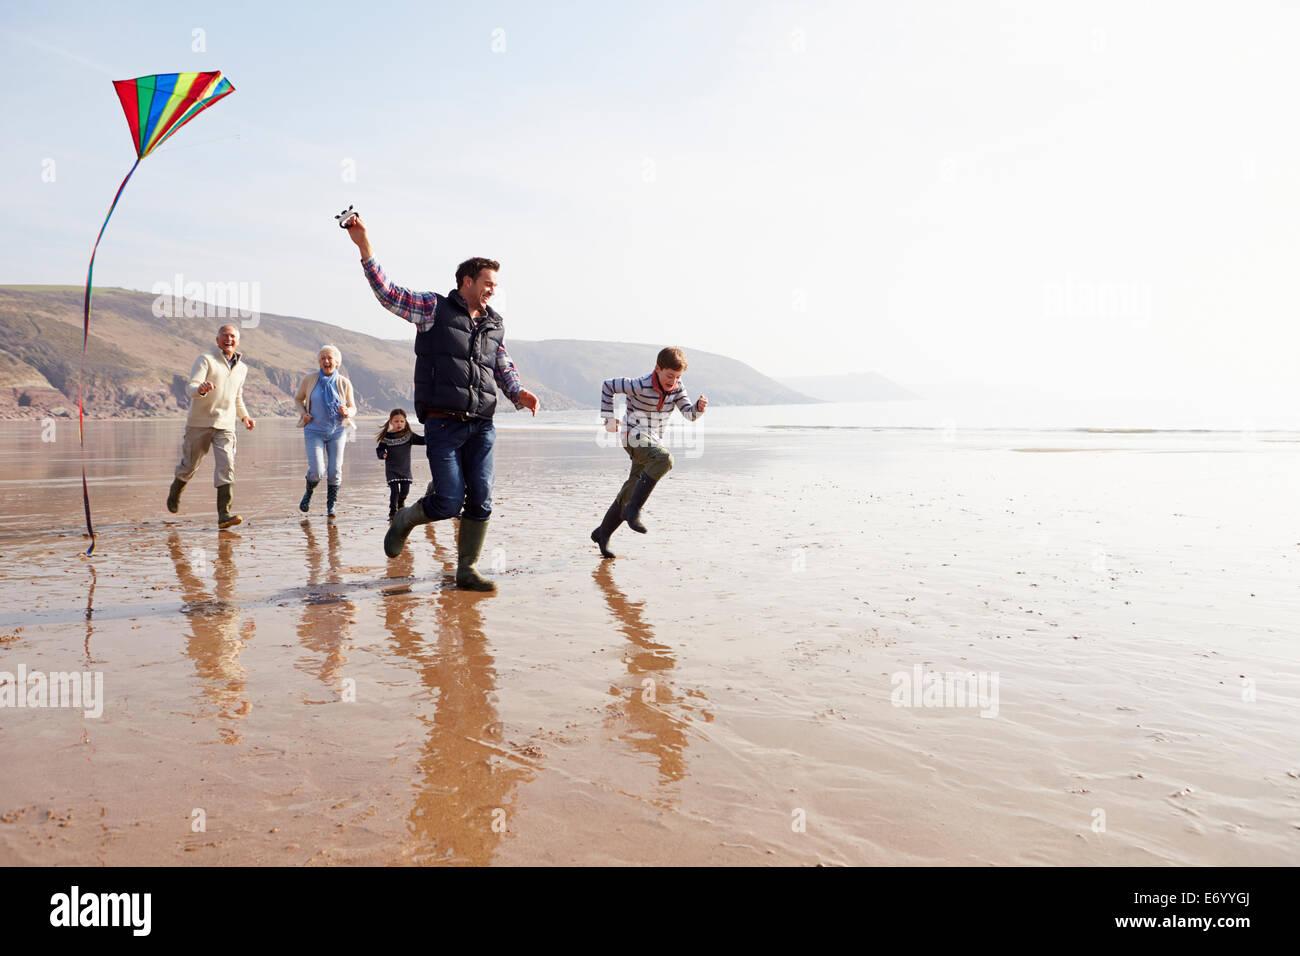 Multi Generation Family Flying Kite On Winter Beach - Stock Image